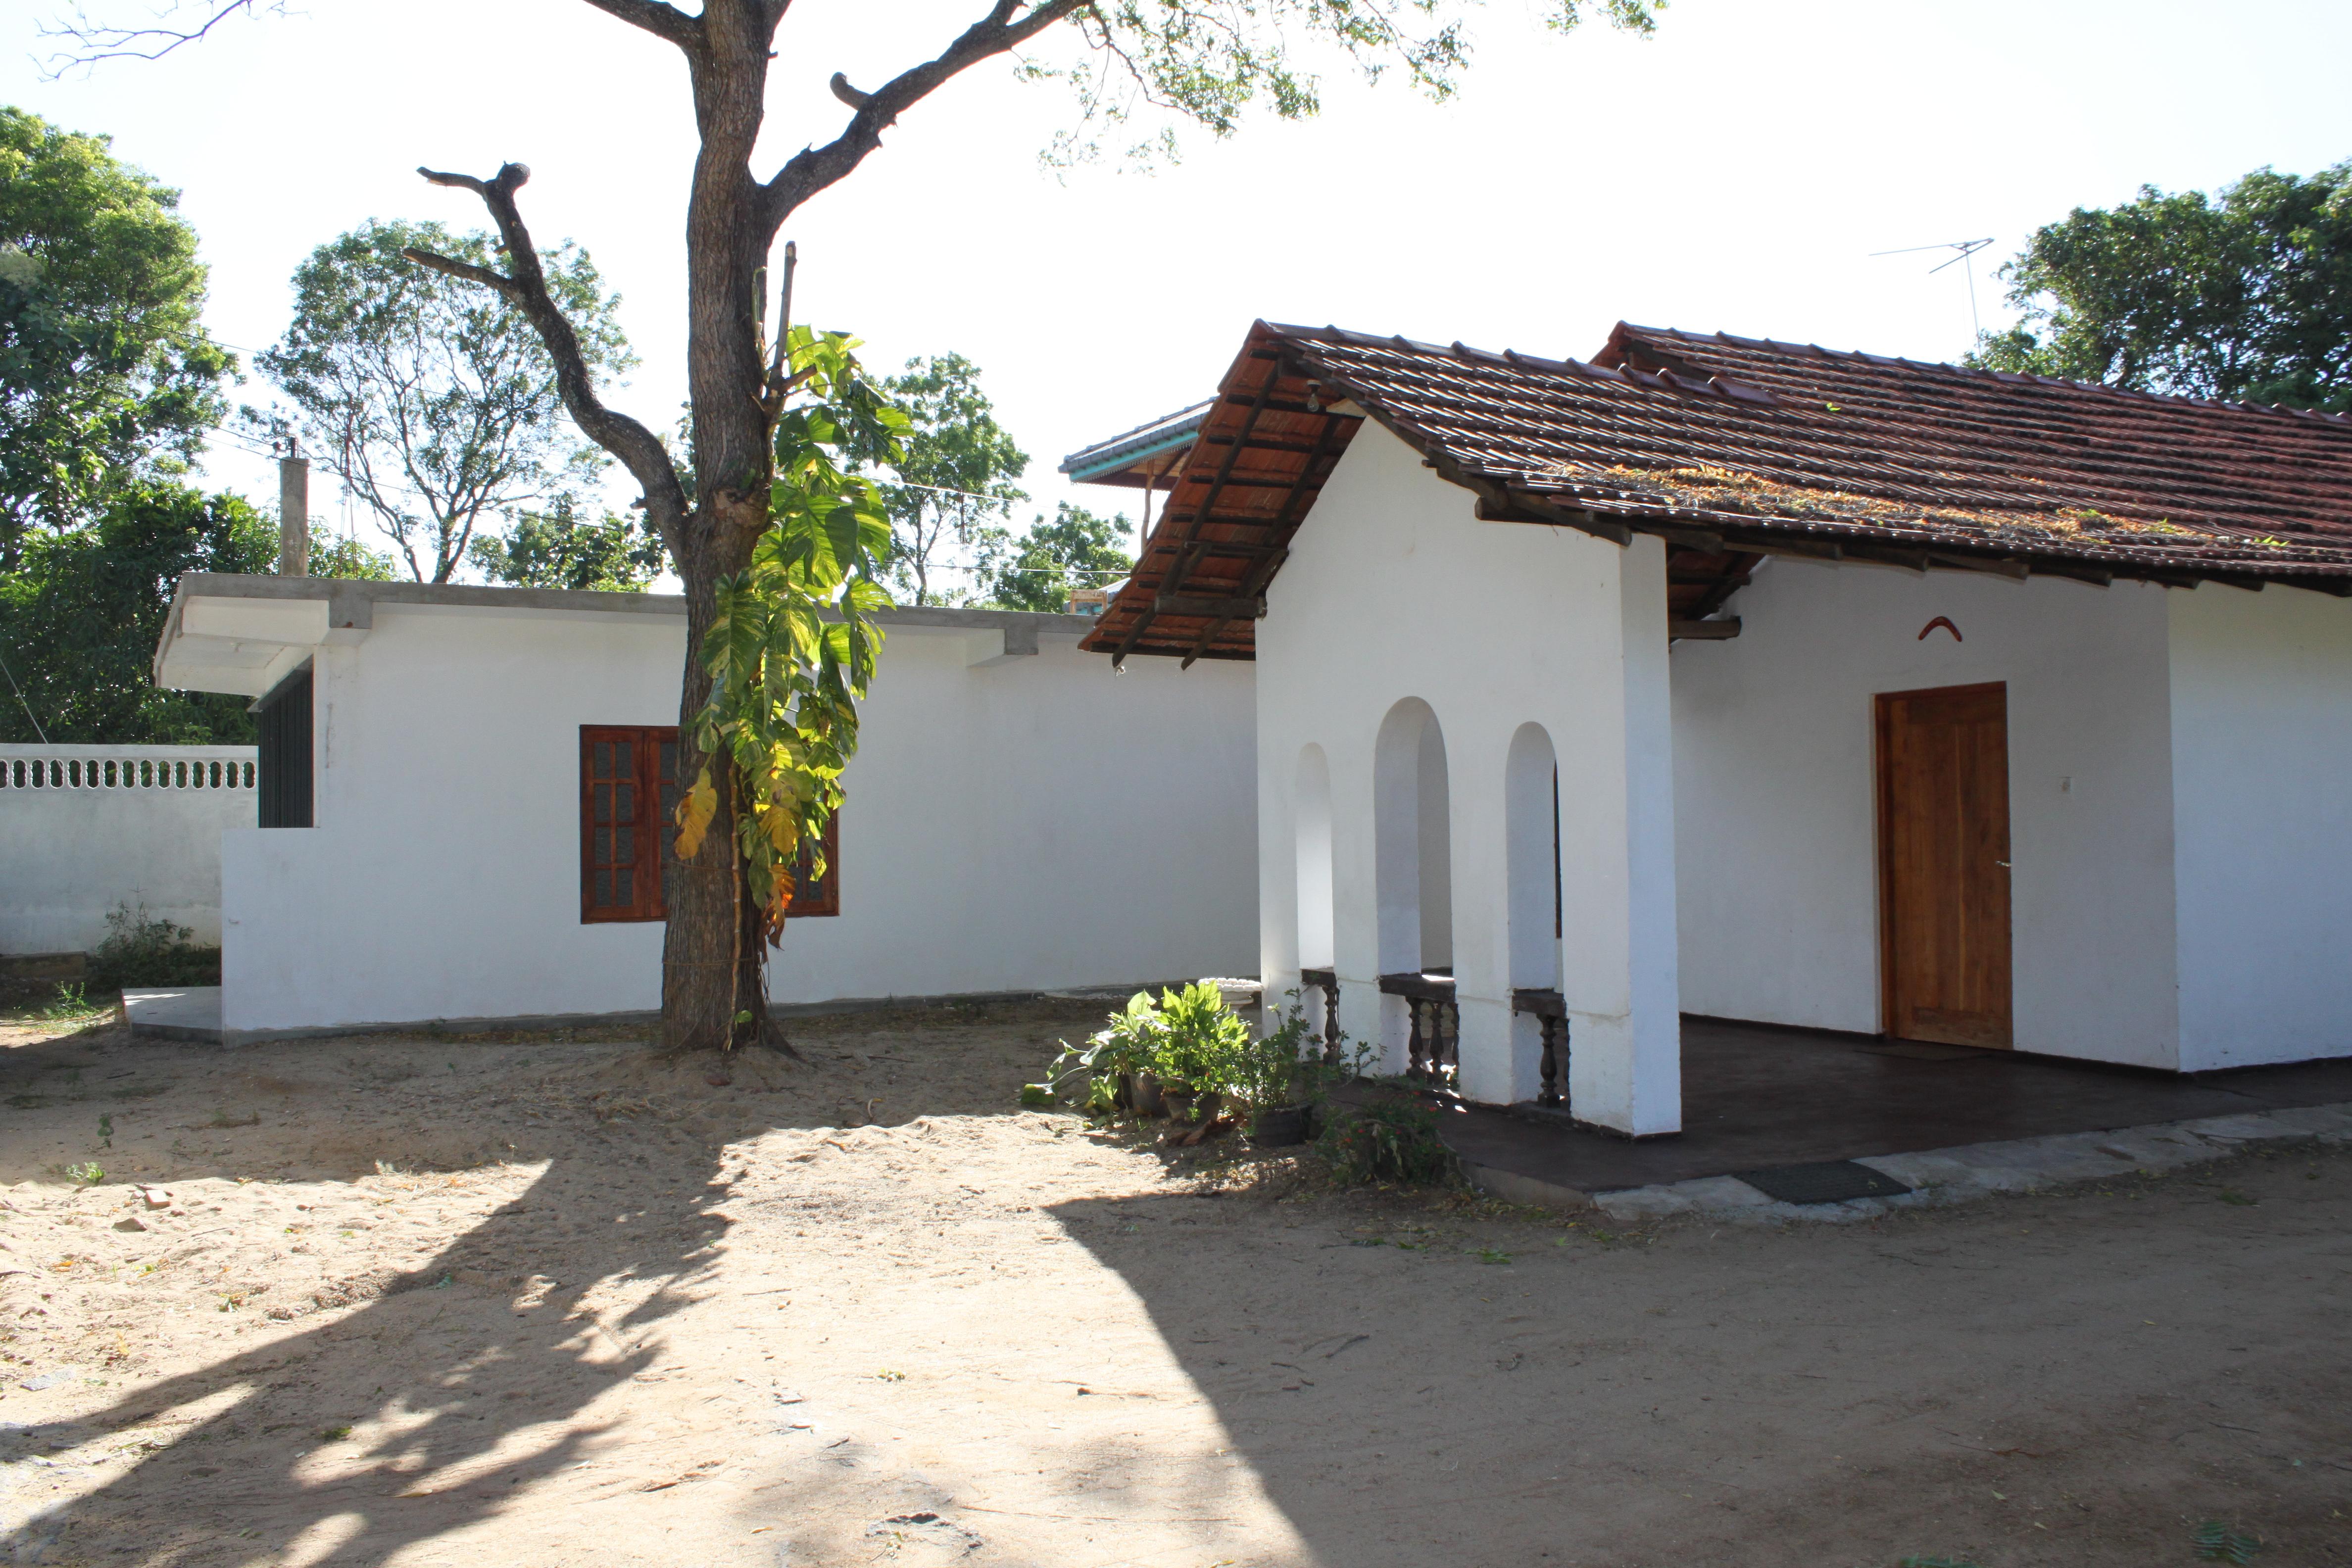 Thanamalwila Sri Lanka House for Sale 2 buildings